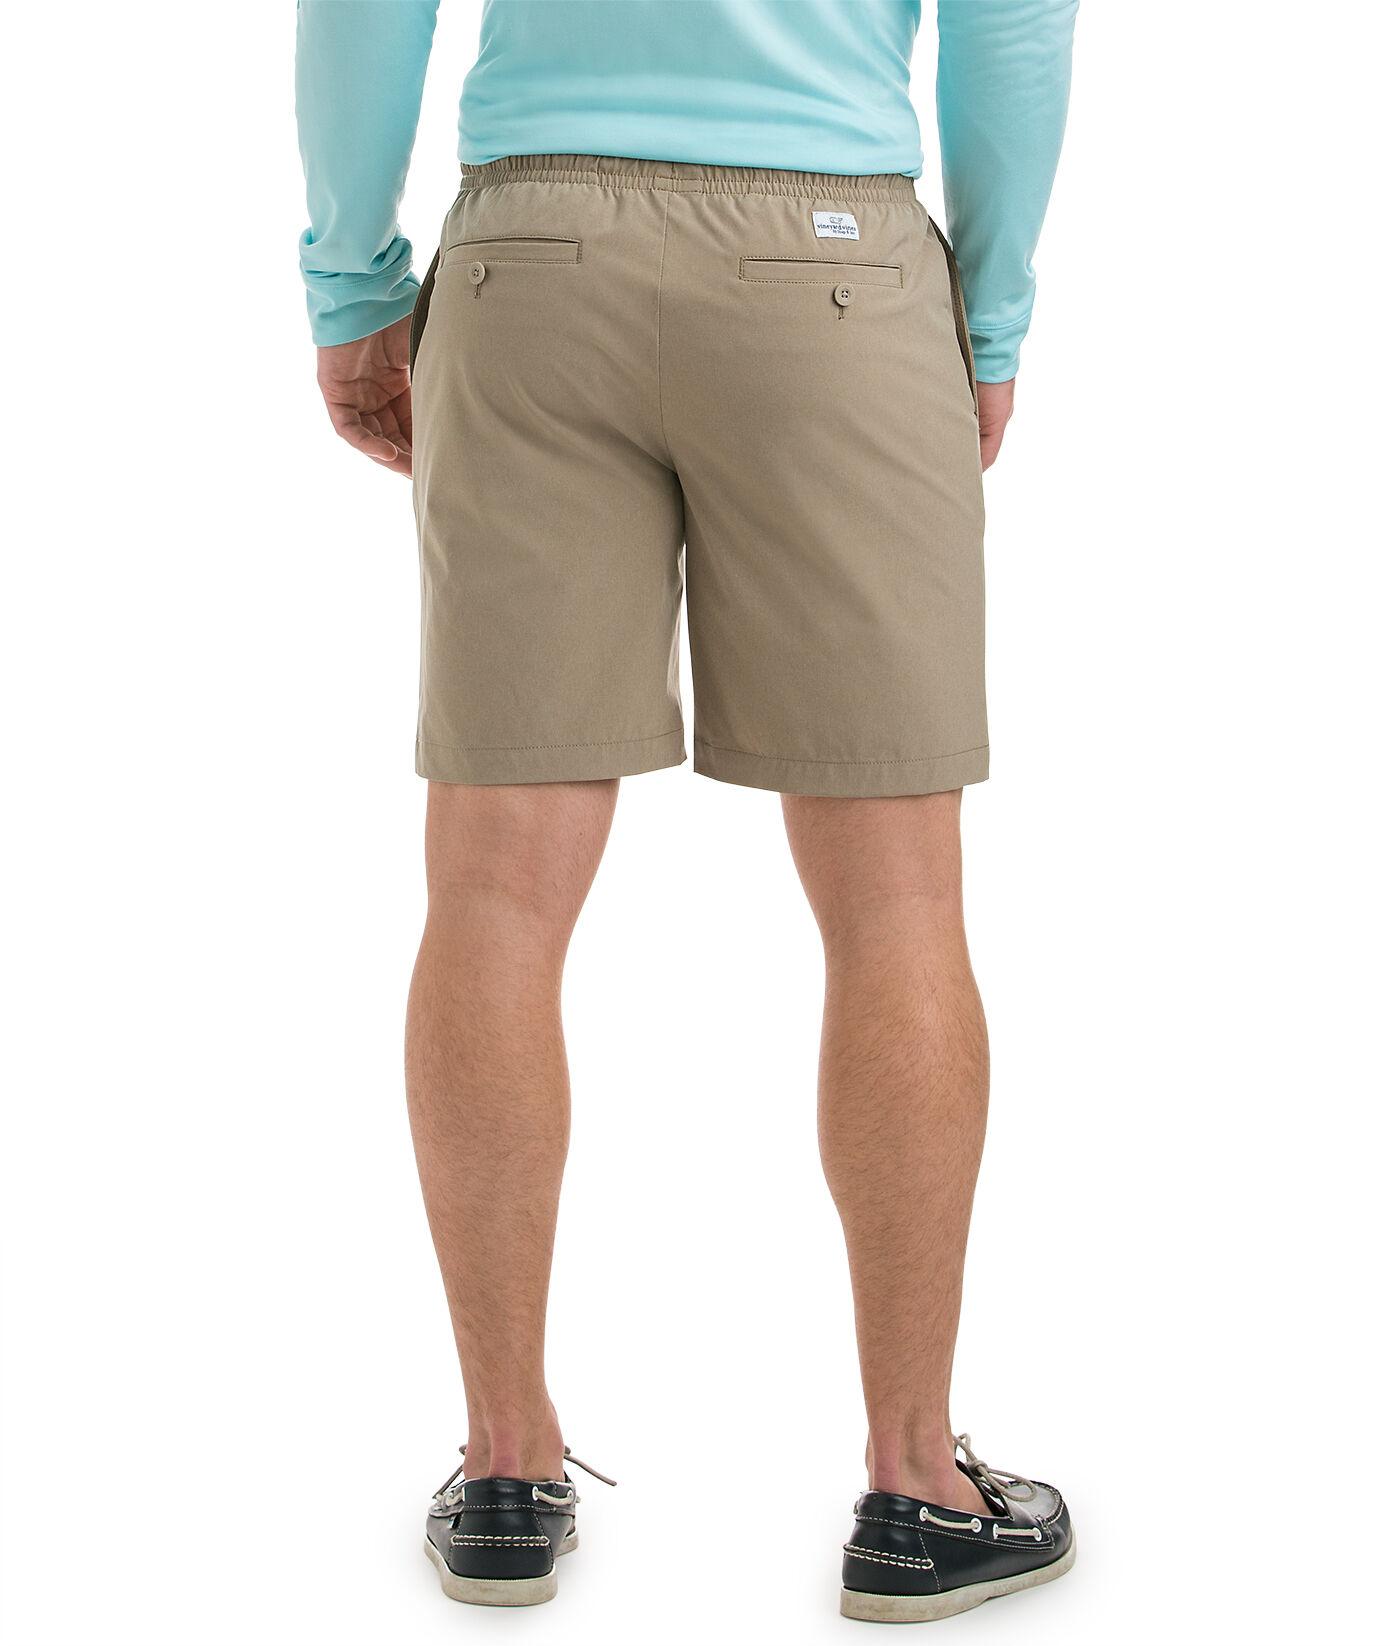 8 inch shorts